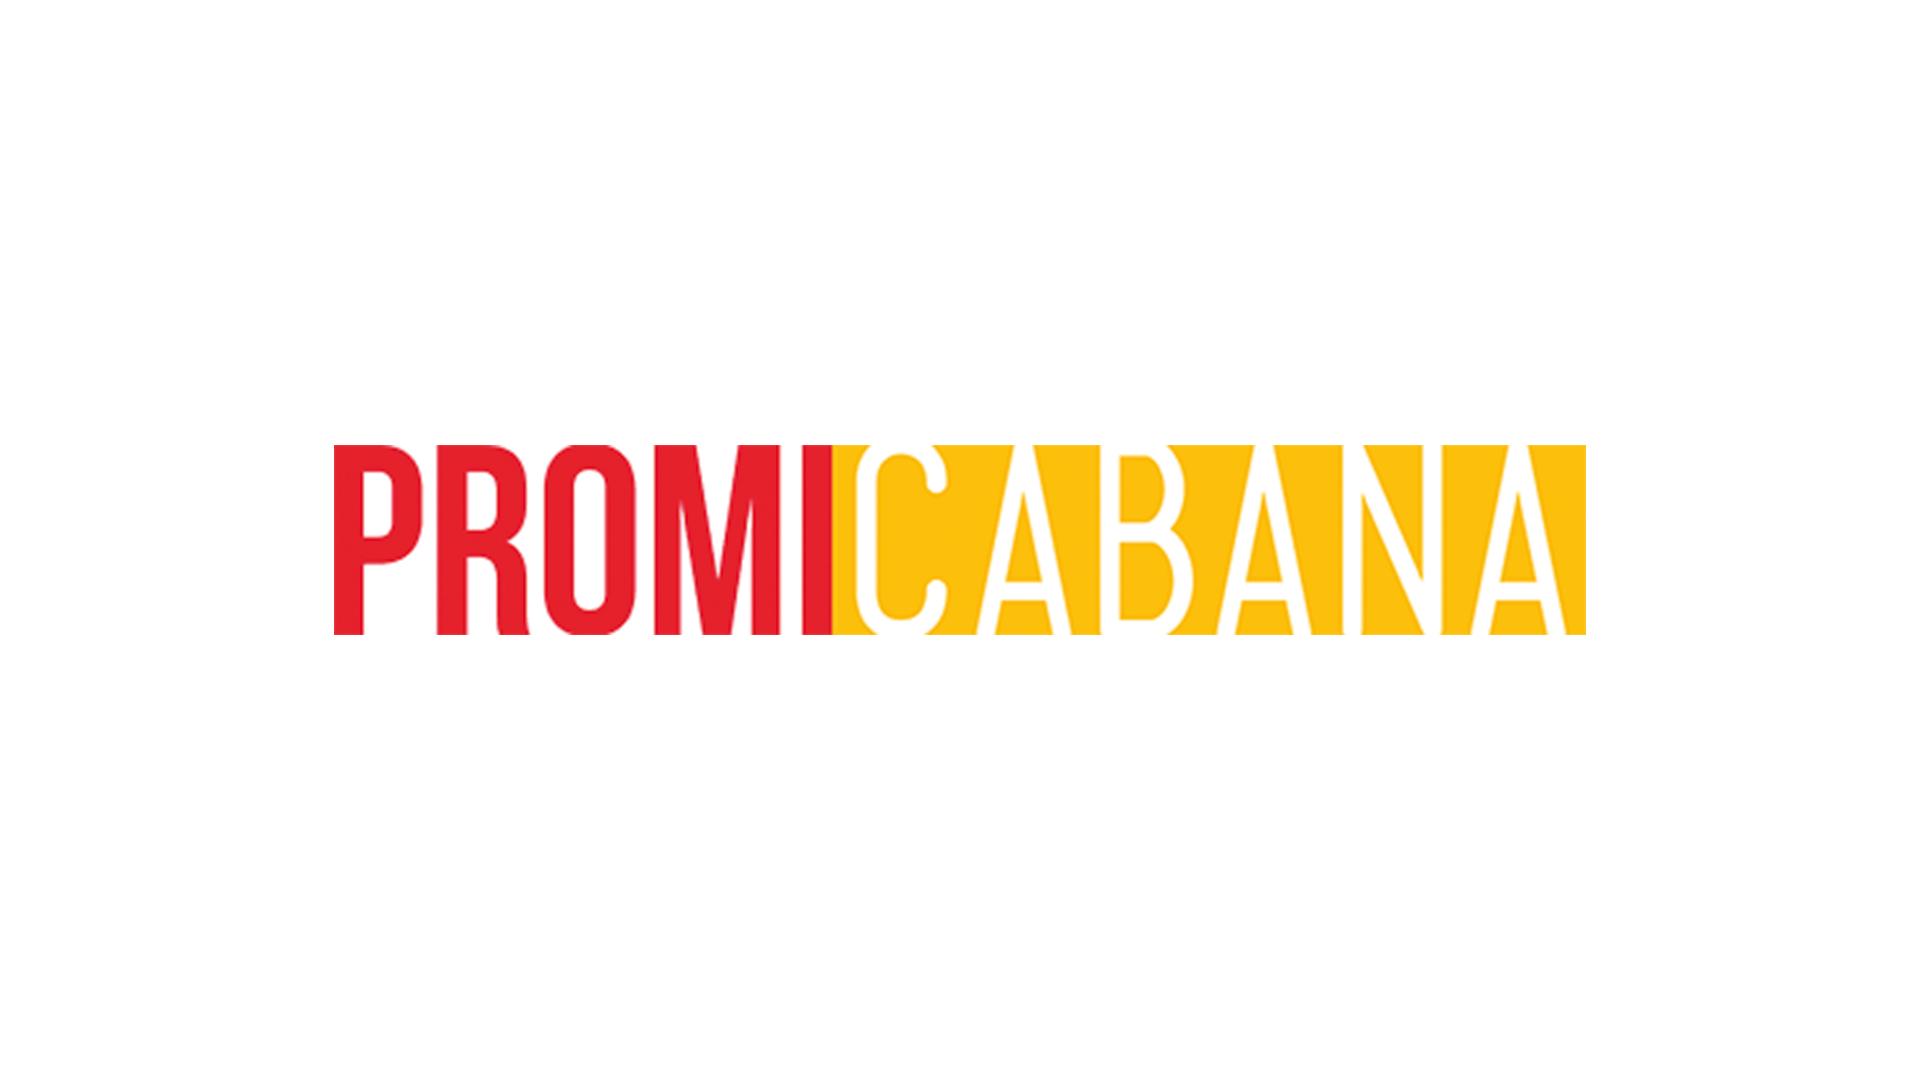 Adam-Levine-Miley-Cyrus-The-Voice-Promo